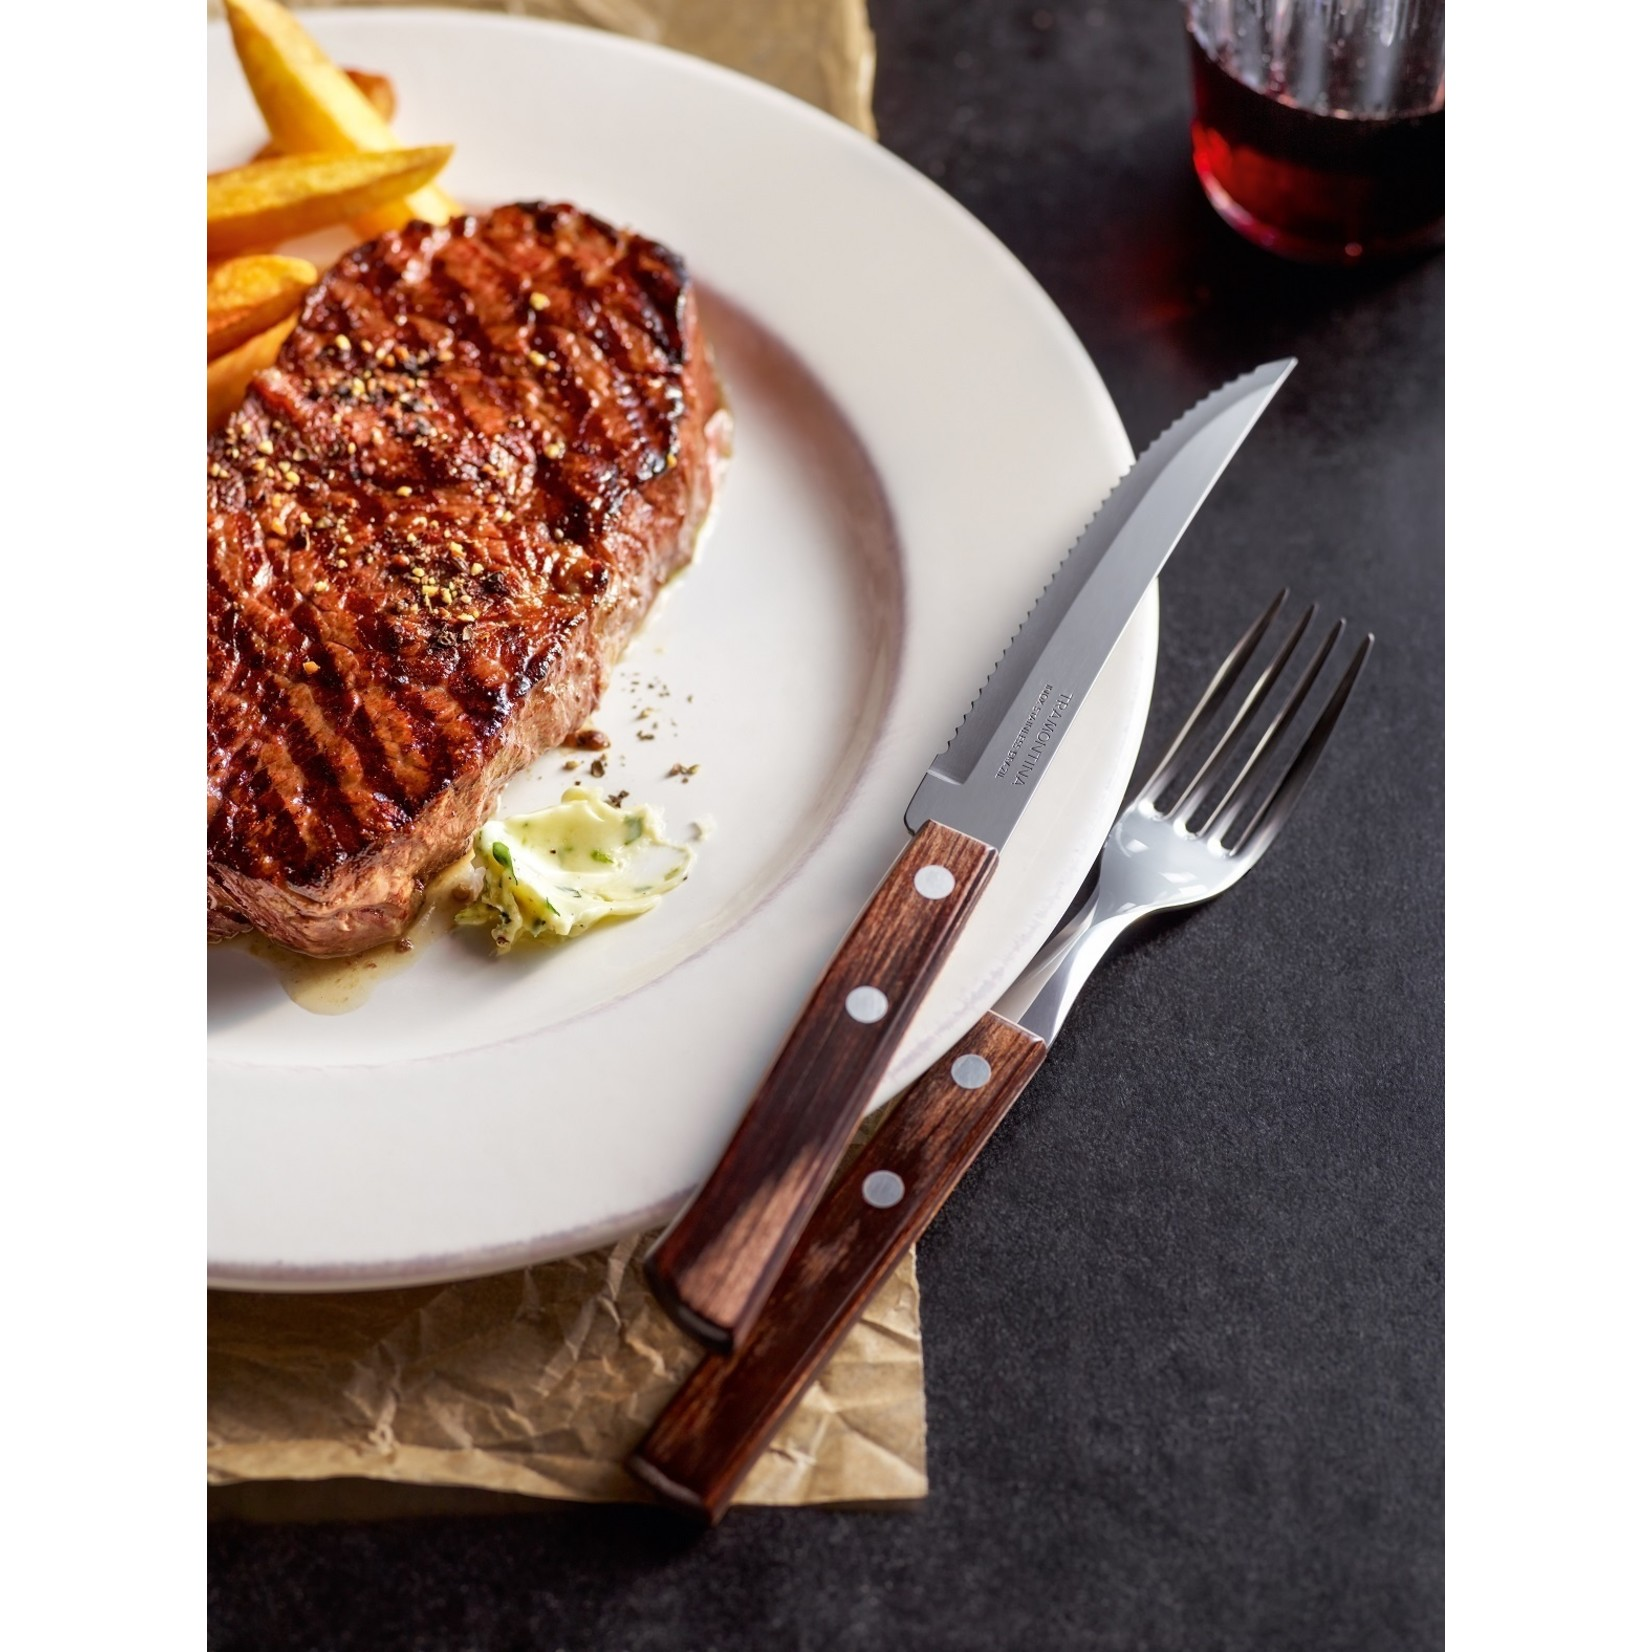 Tramontina Tramontina Churrasco steakmessenset 6-delig bruin